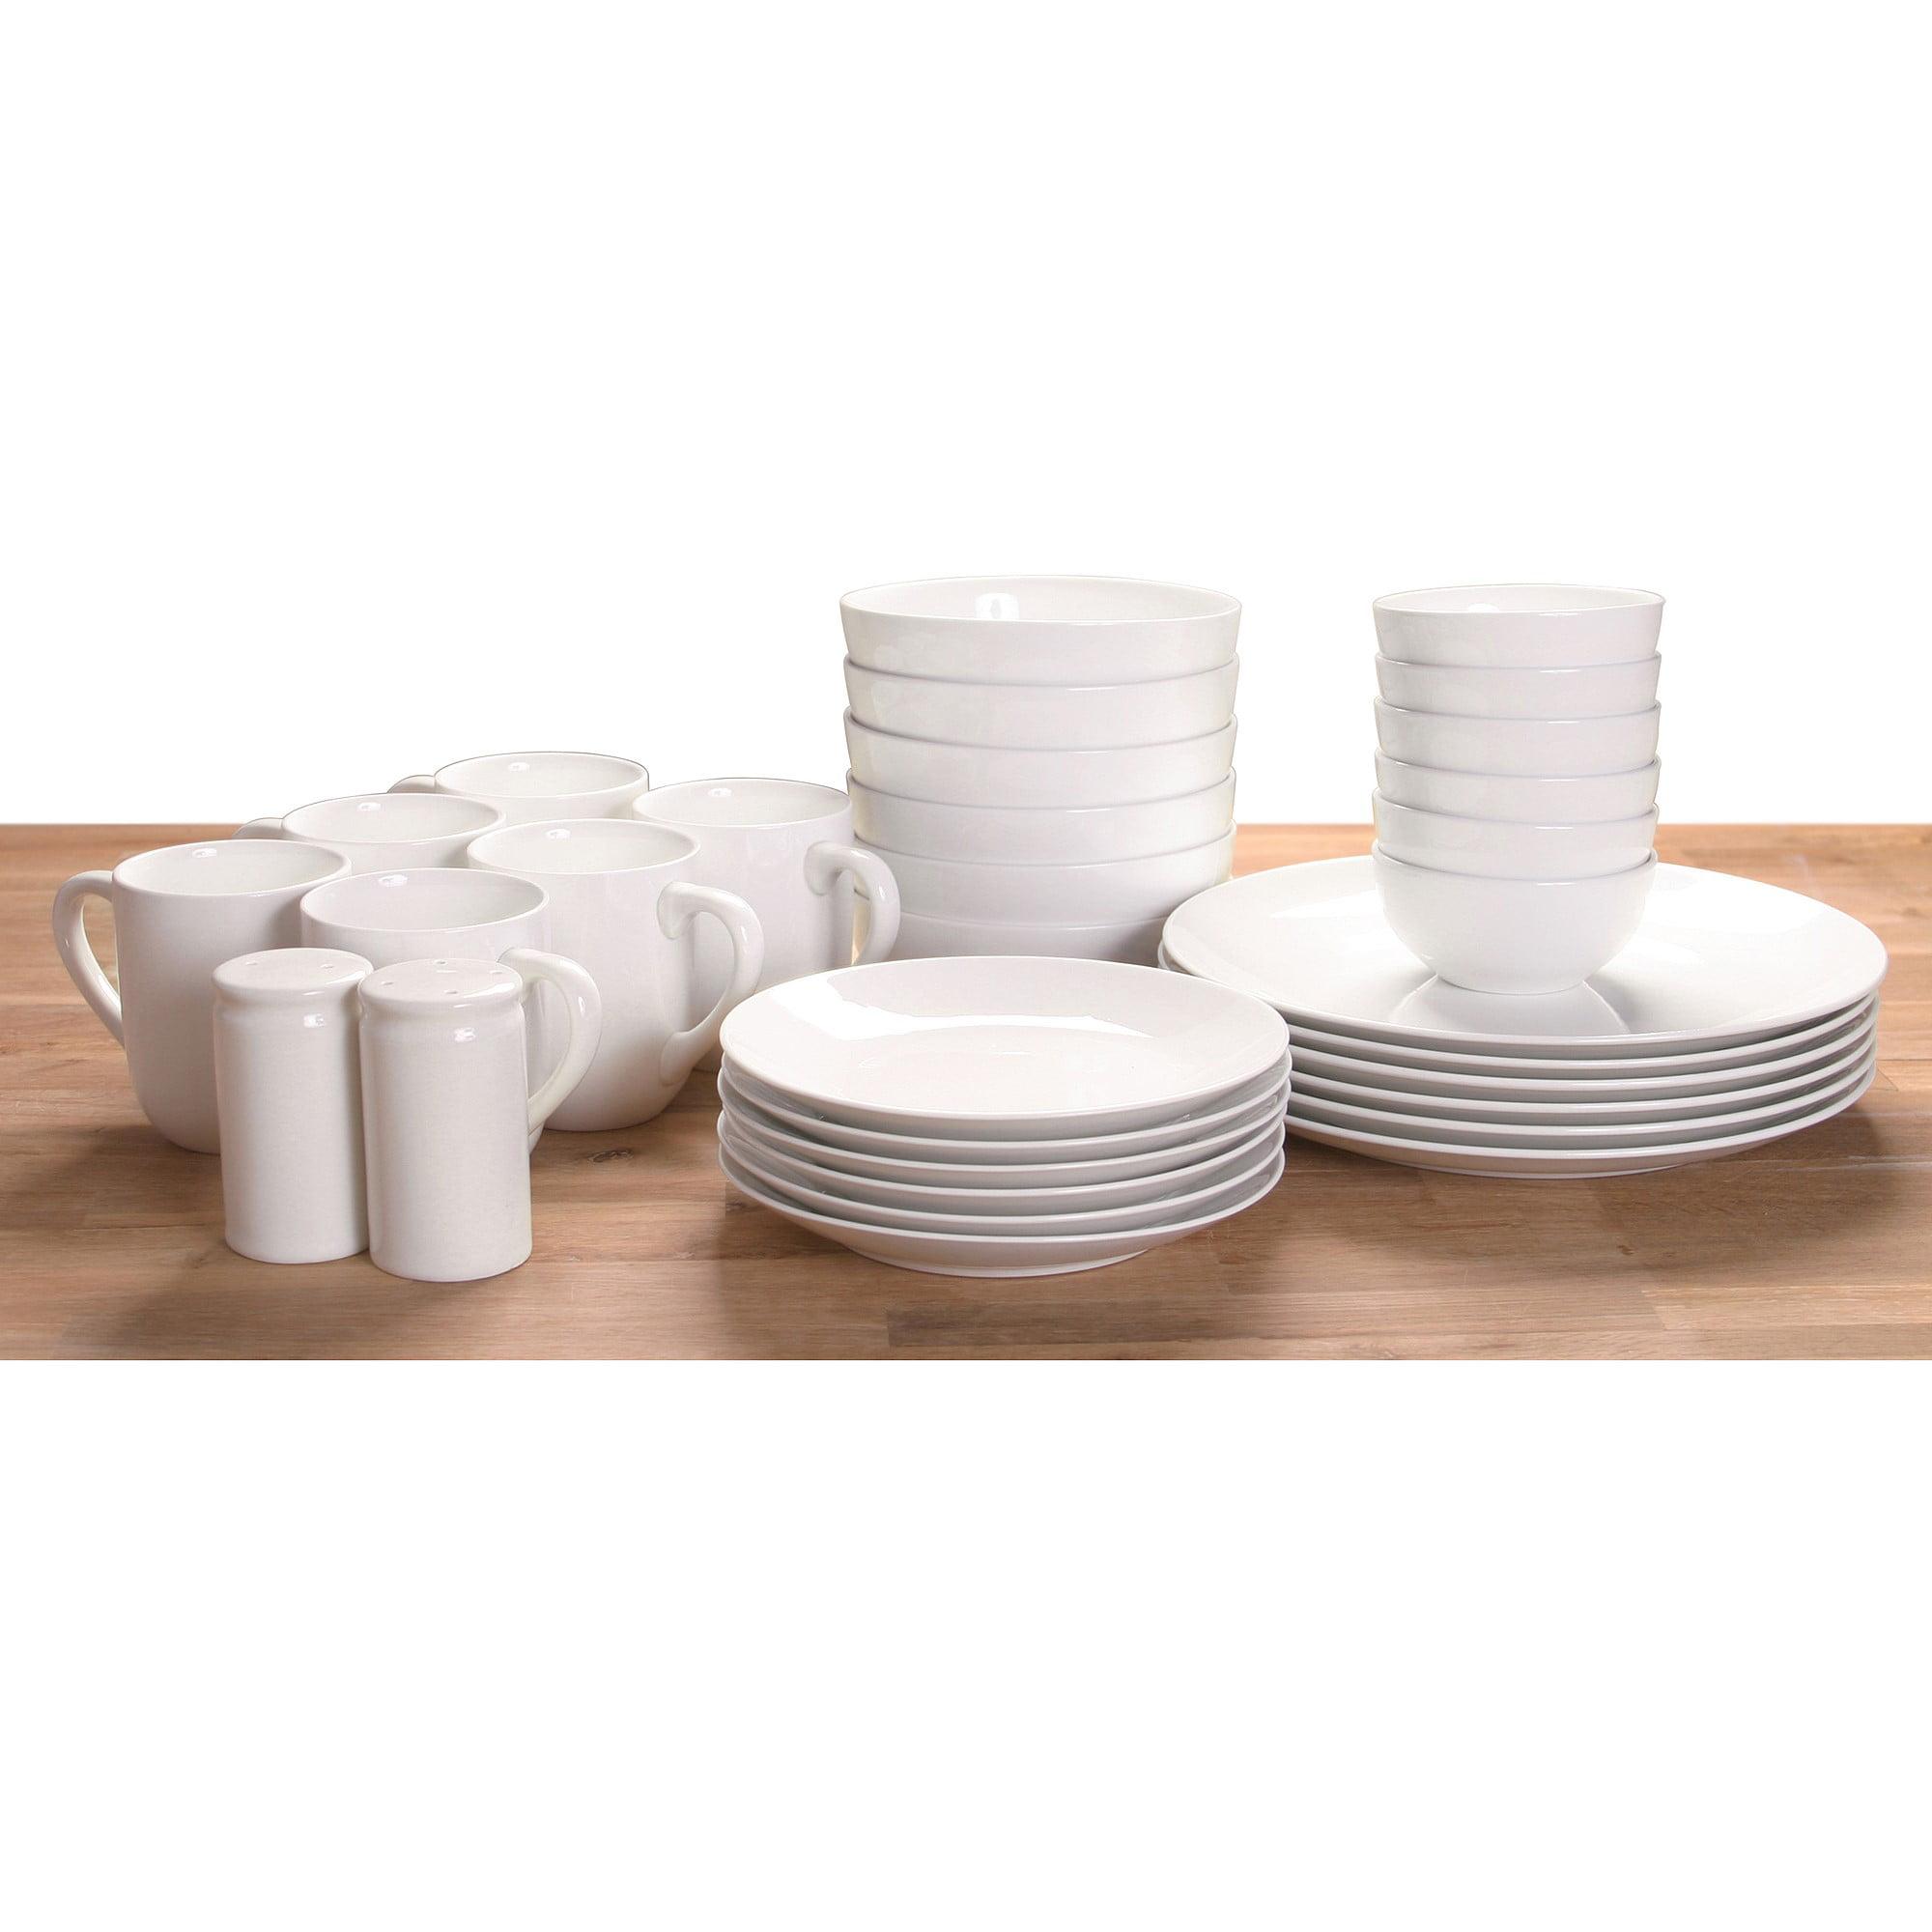 Mainstays 32-piece White Stoneware Dinnerware Set - Walmart.com